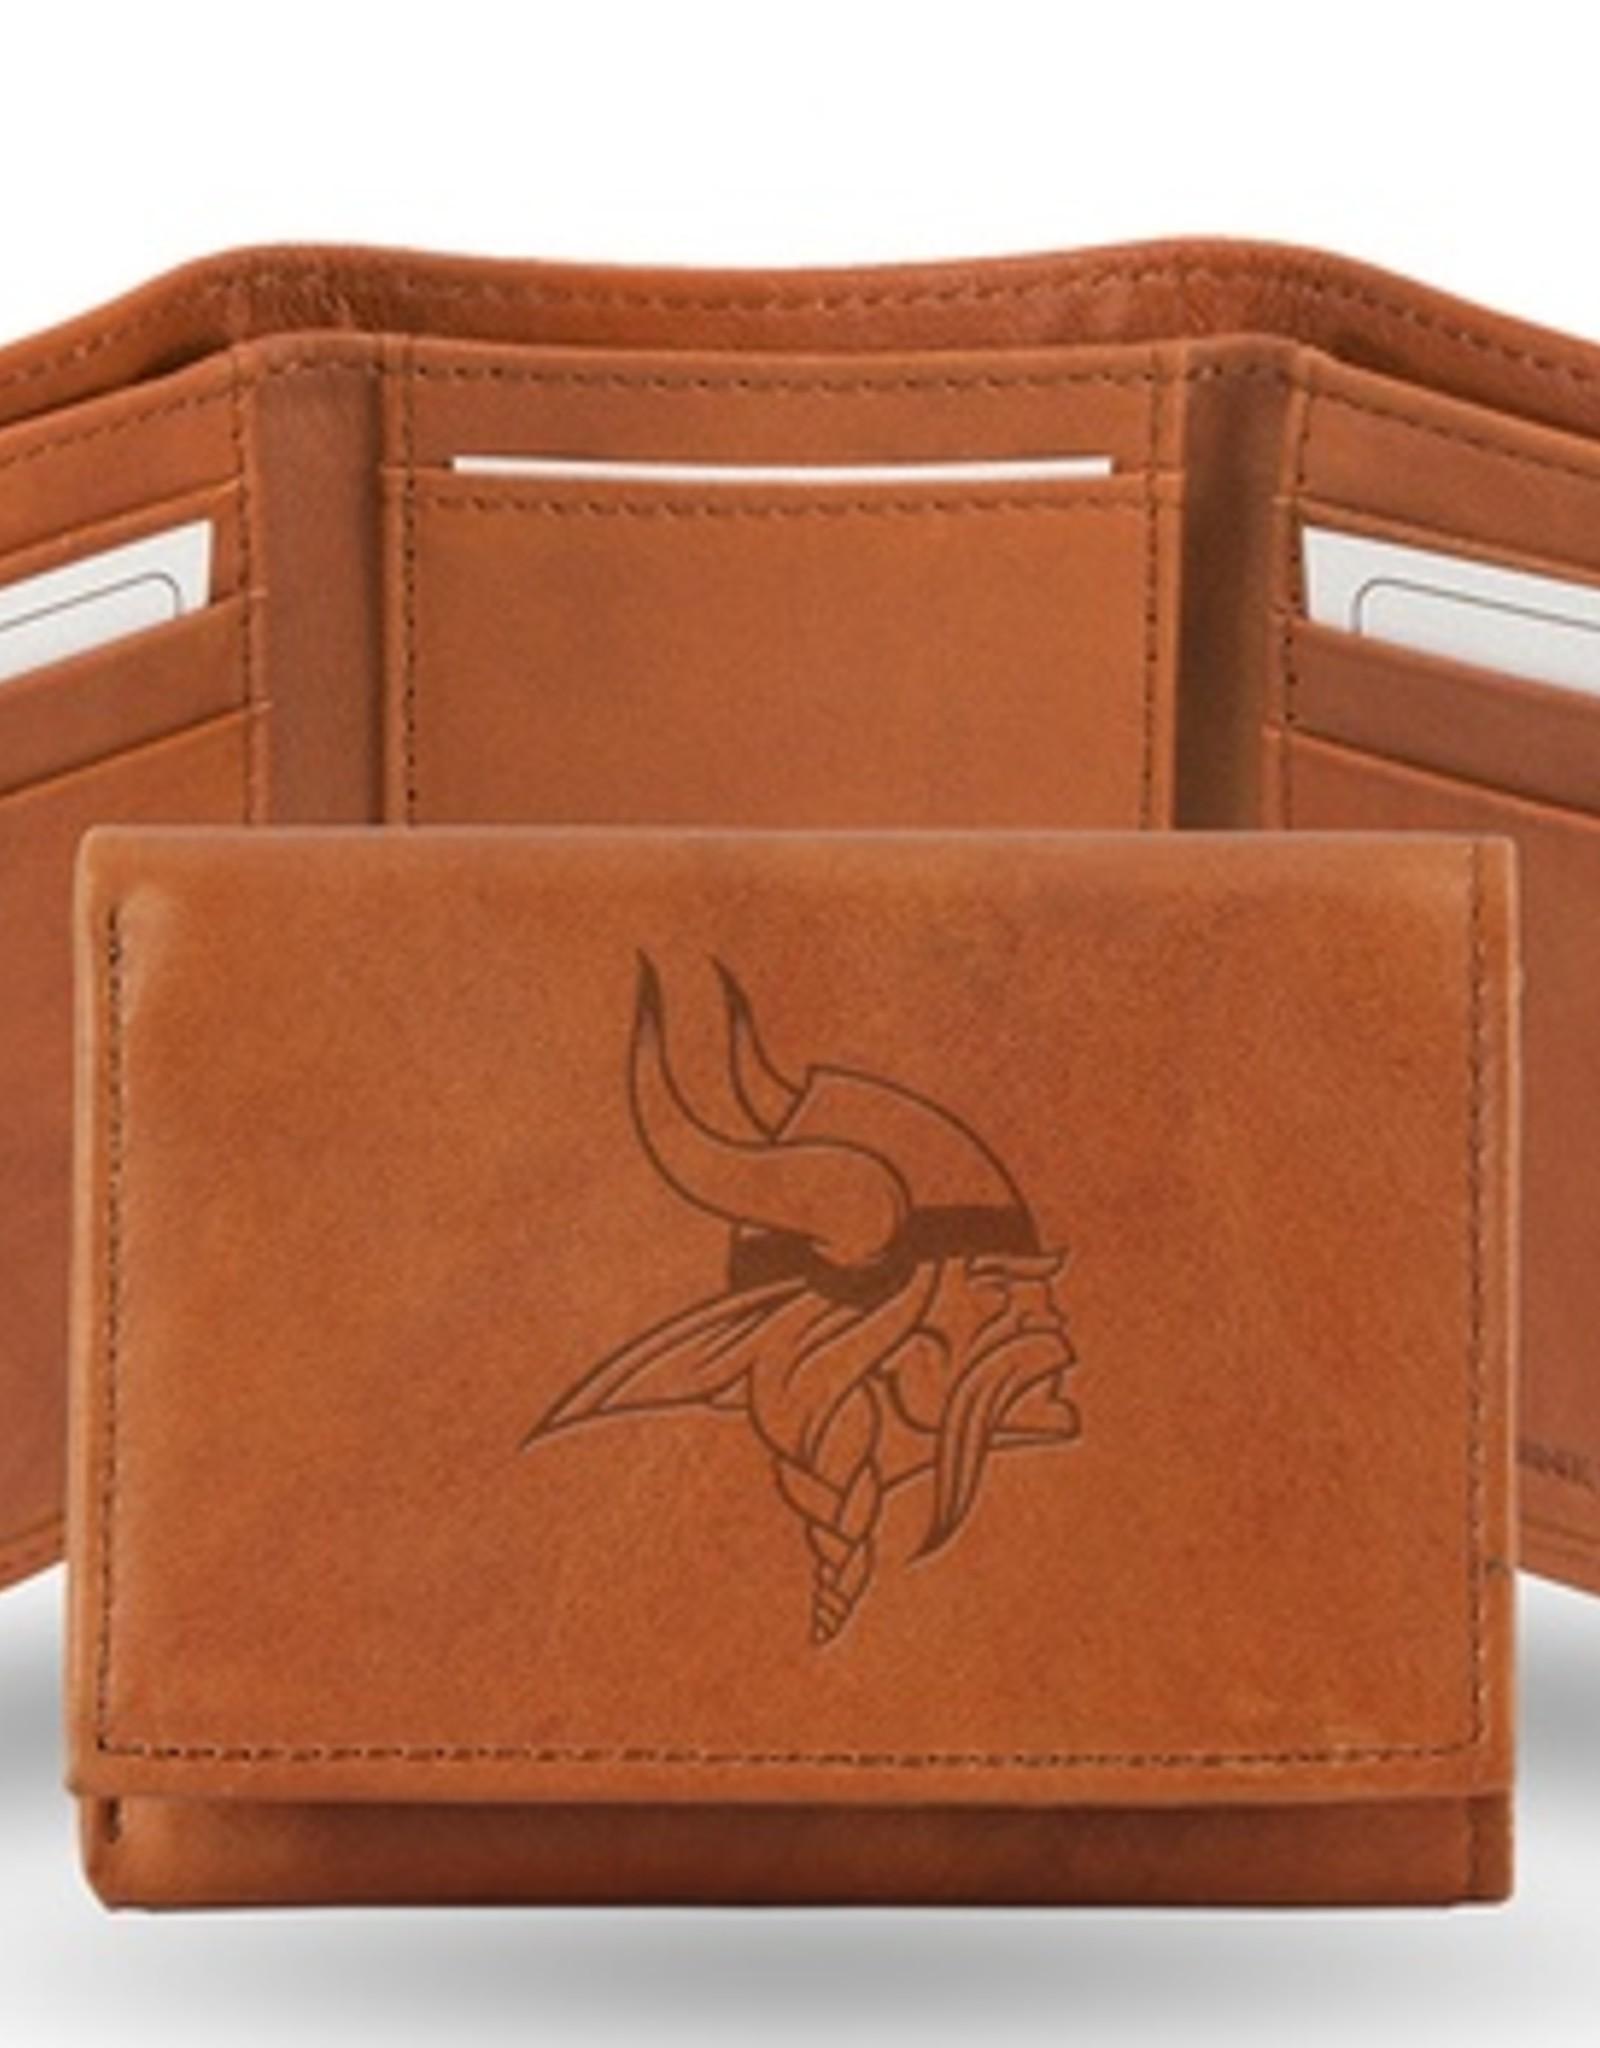 RICO INDUSTRIES Minnesota Vikings Genuine Leather Vintage Trifold Wallet